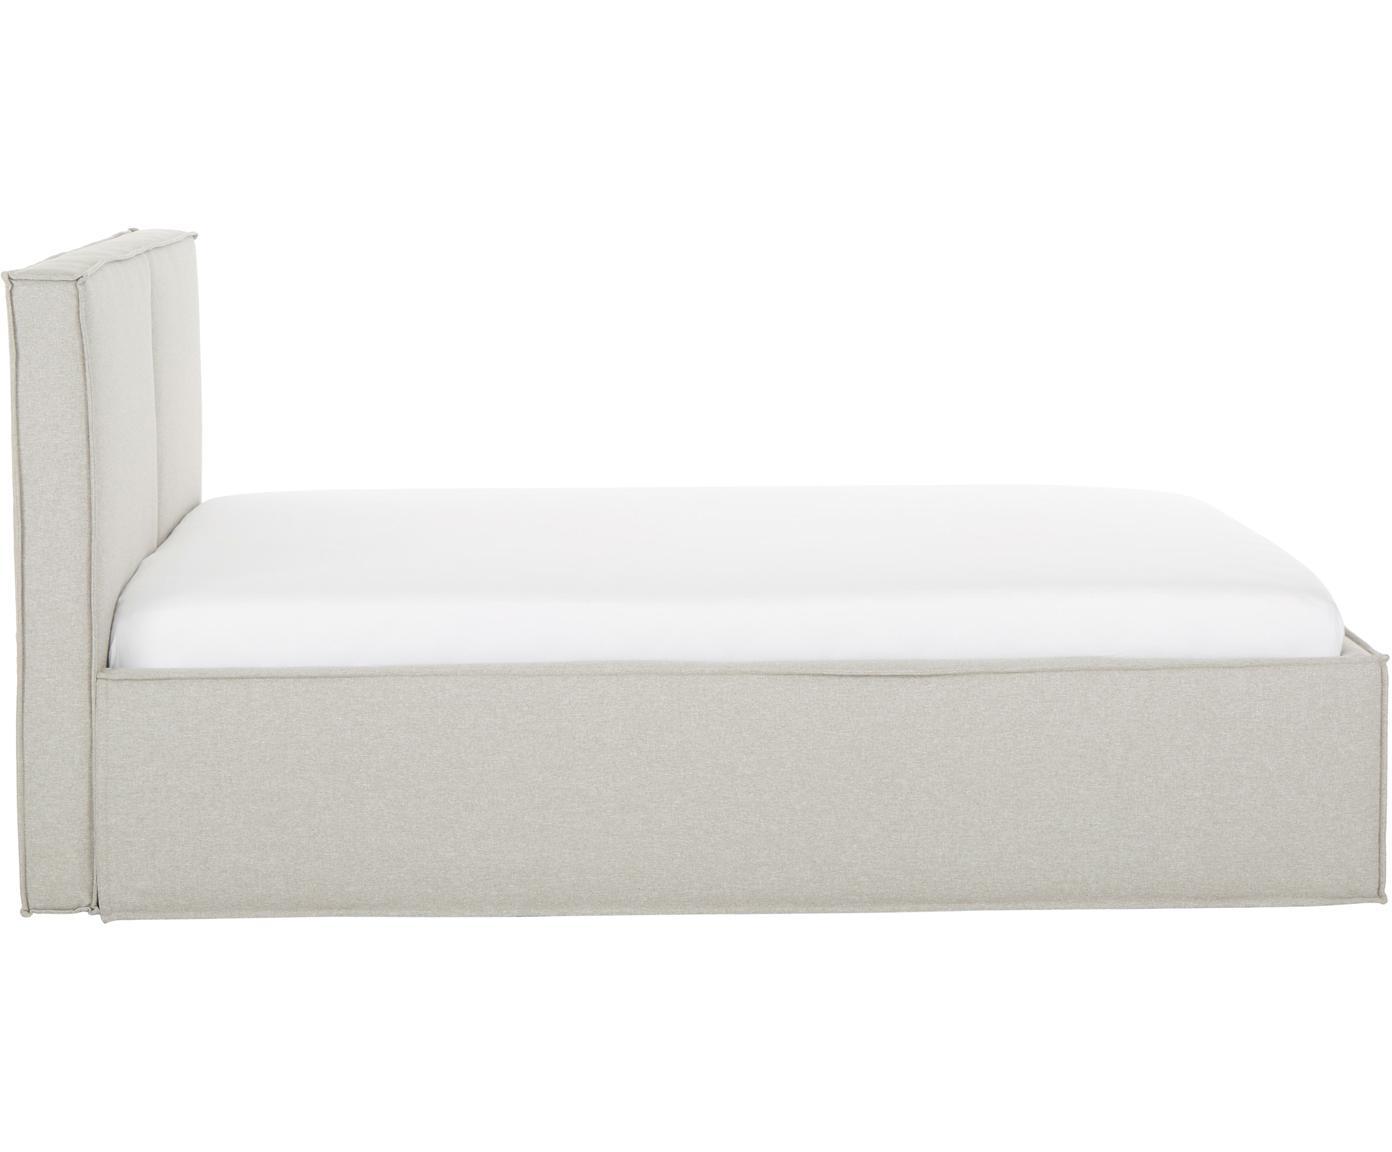 Polsterbett Dream, Korpus: Massives Kiefernholz, Bezug: Polyester (Strukturstoff), Webstoff Beige, 180 x 200 cm